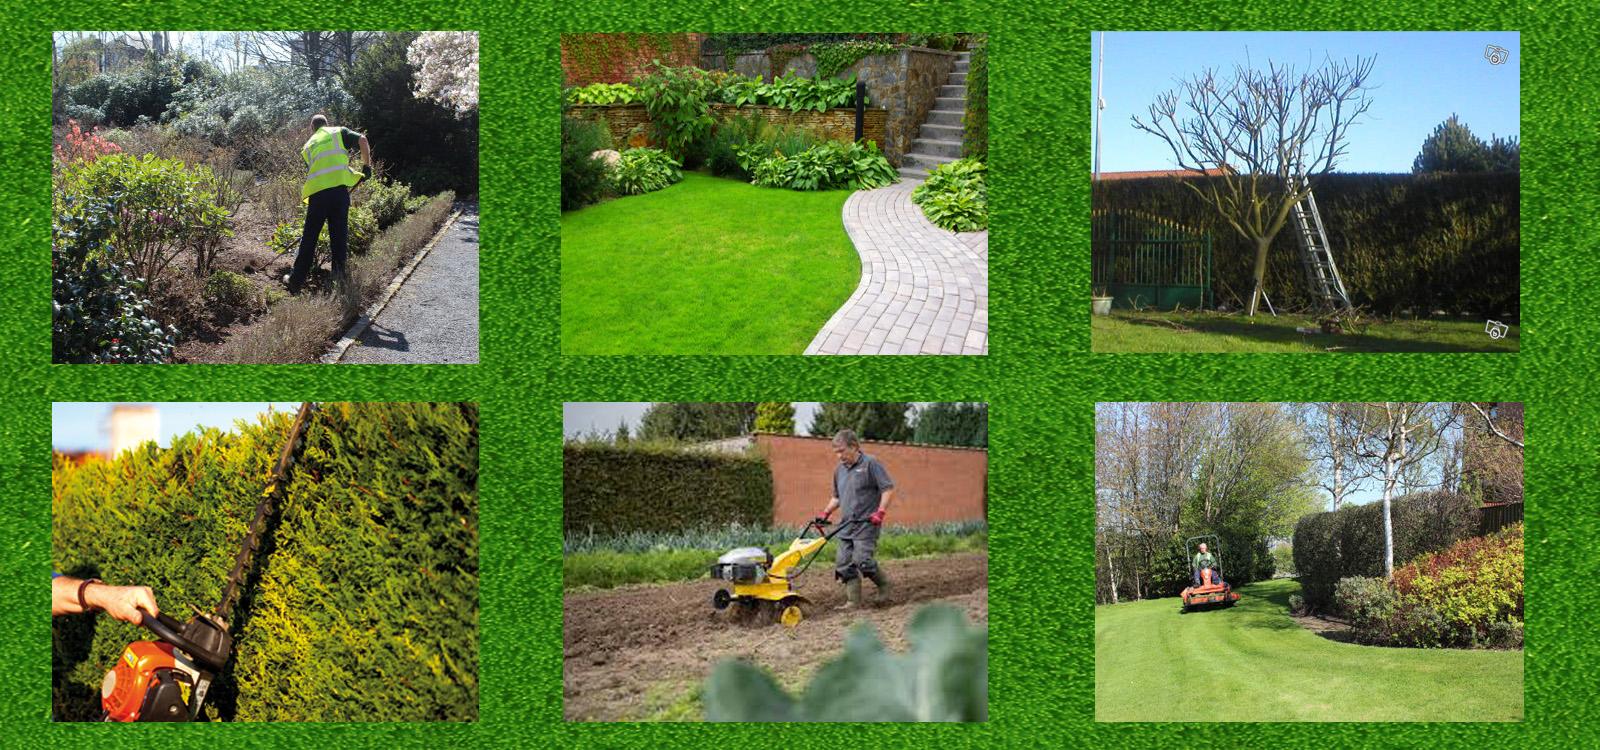 Entretien d espaces verts et jardins jardinage lille for Tarif entretien jardin